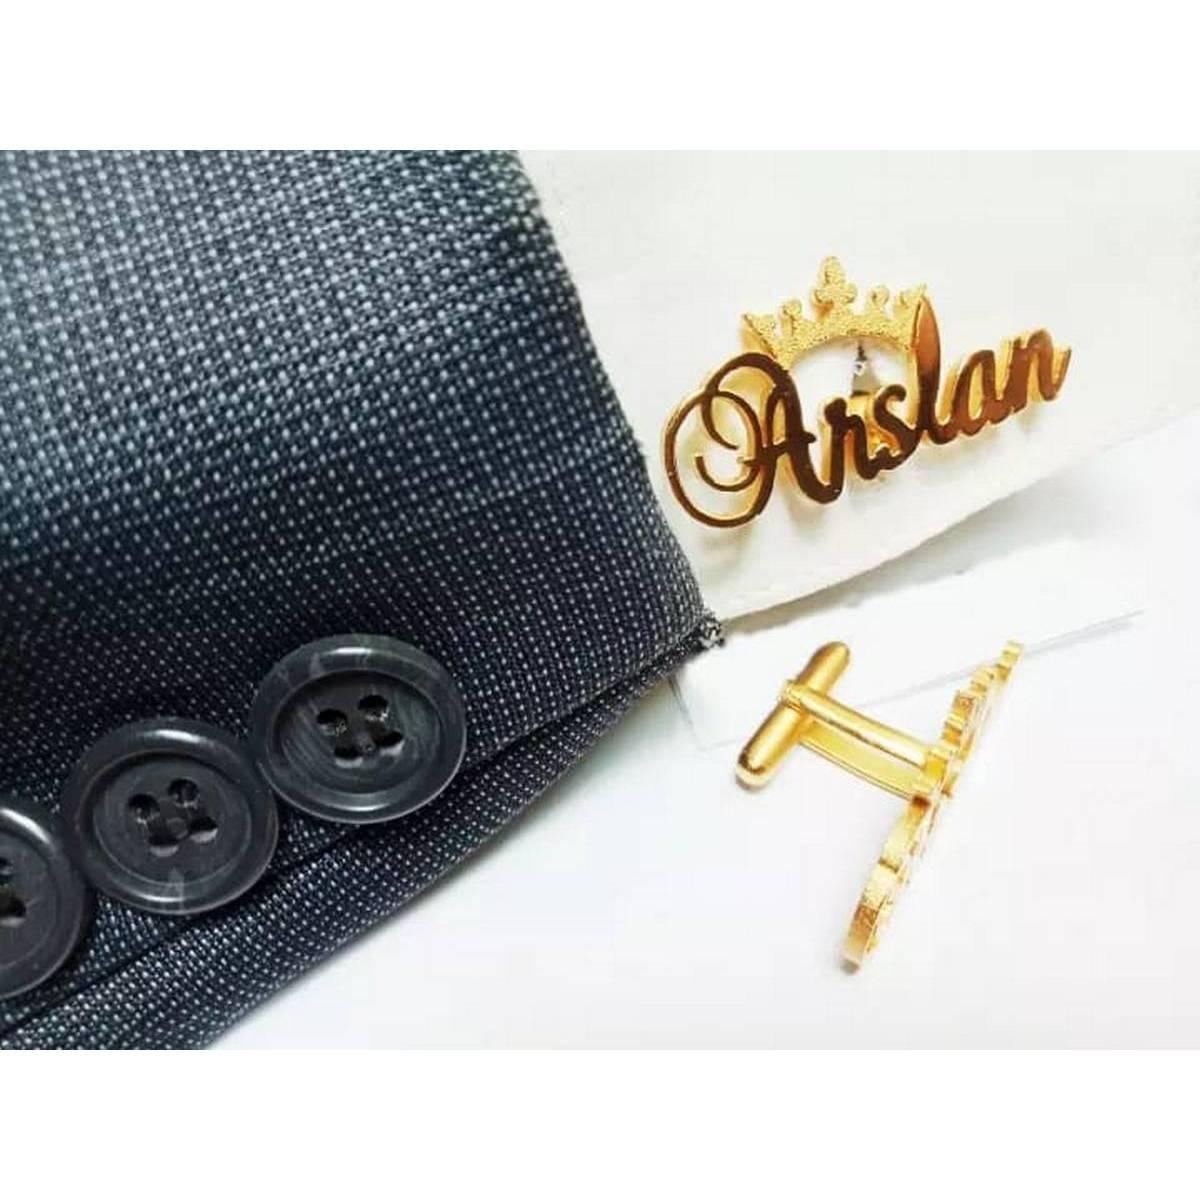 Custom 24K Gold Plated Name Cuff links